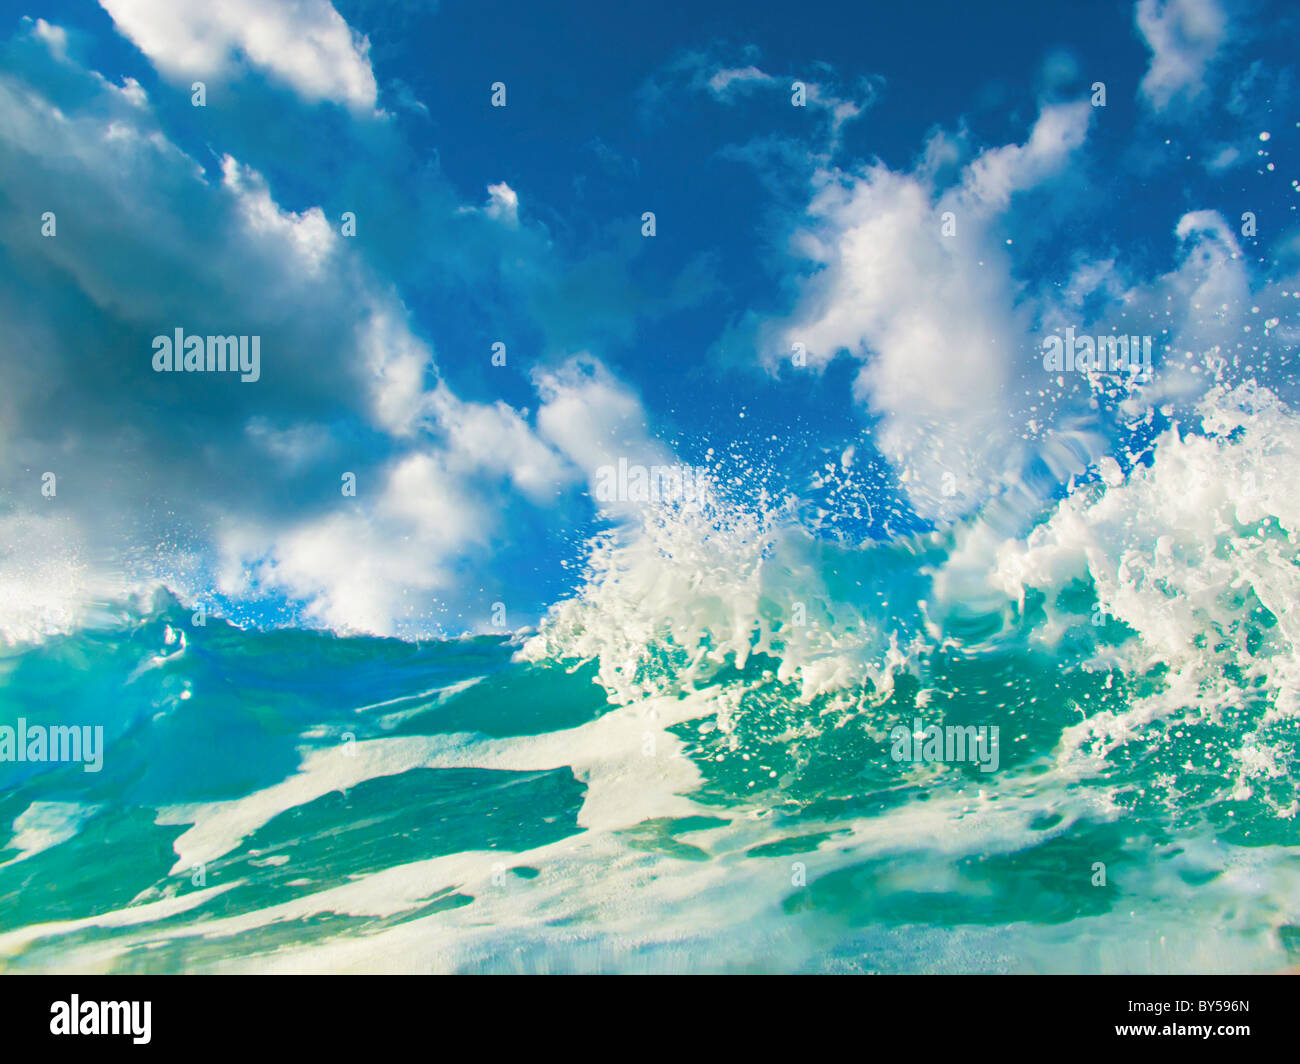 Crashing Green Wave with cloudy blue sky behind. Photograph taken on La Canteras Beach, Gran Canaria. - Stock Image